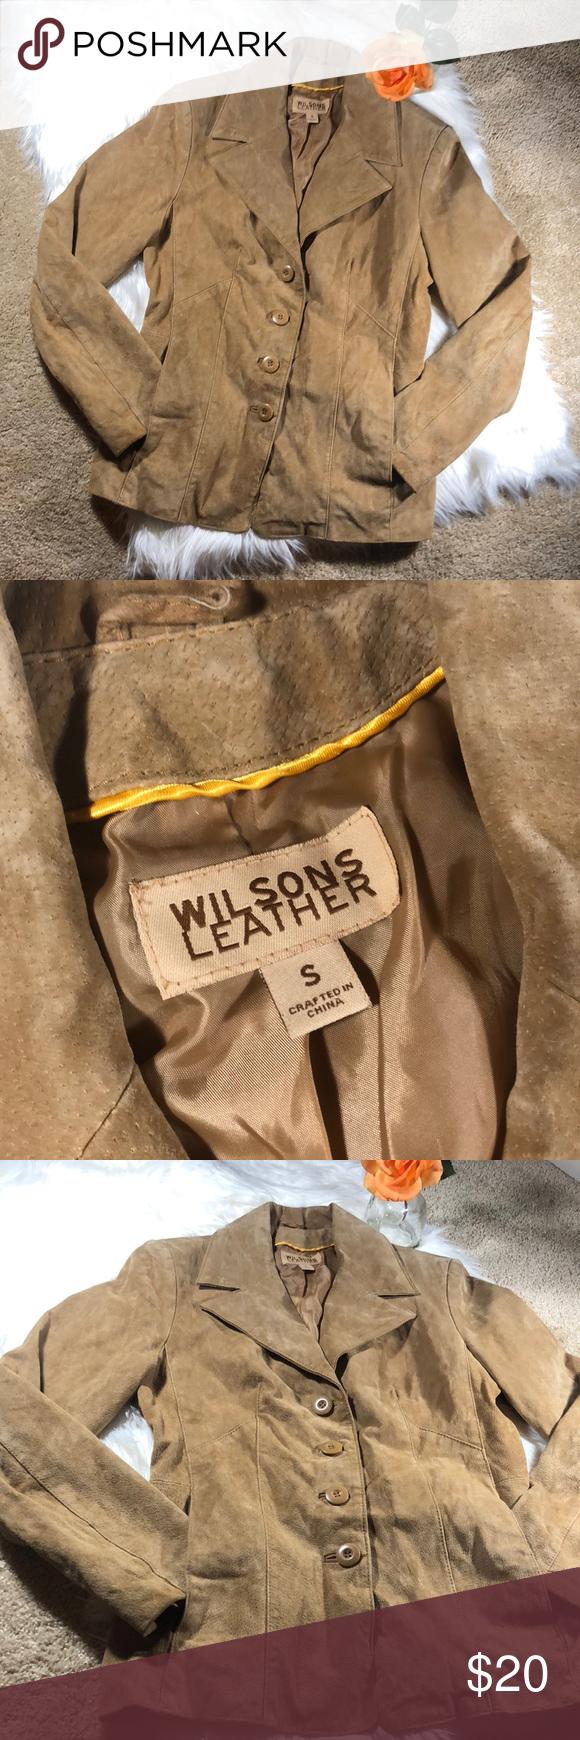 3/21! Wilson's Leather Suede tan coat Clothes design